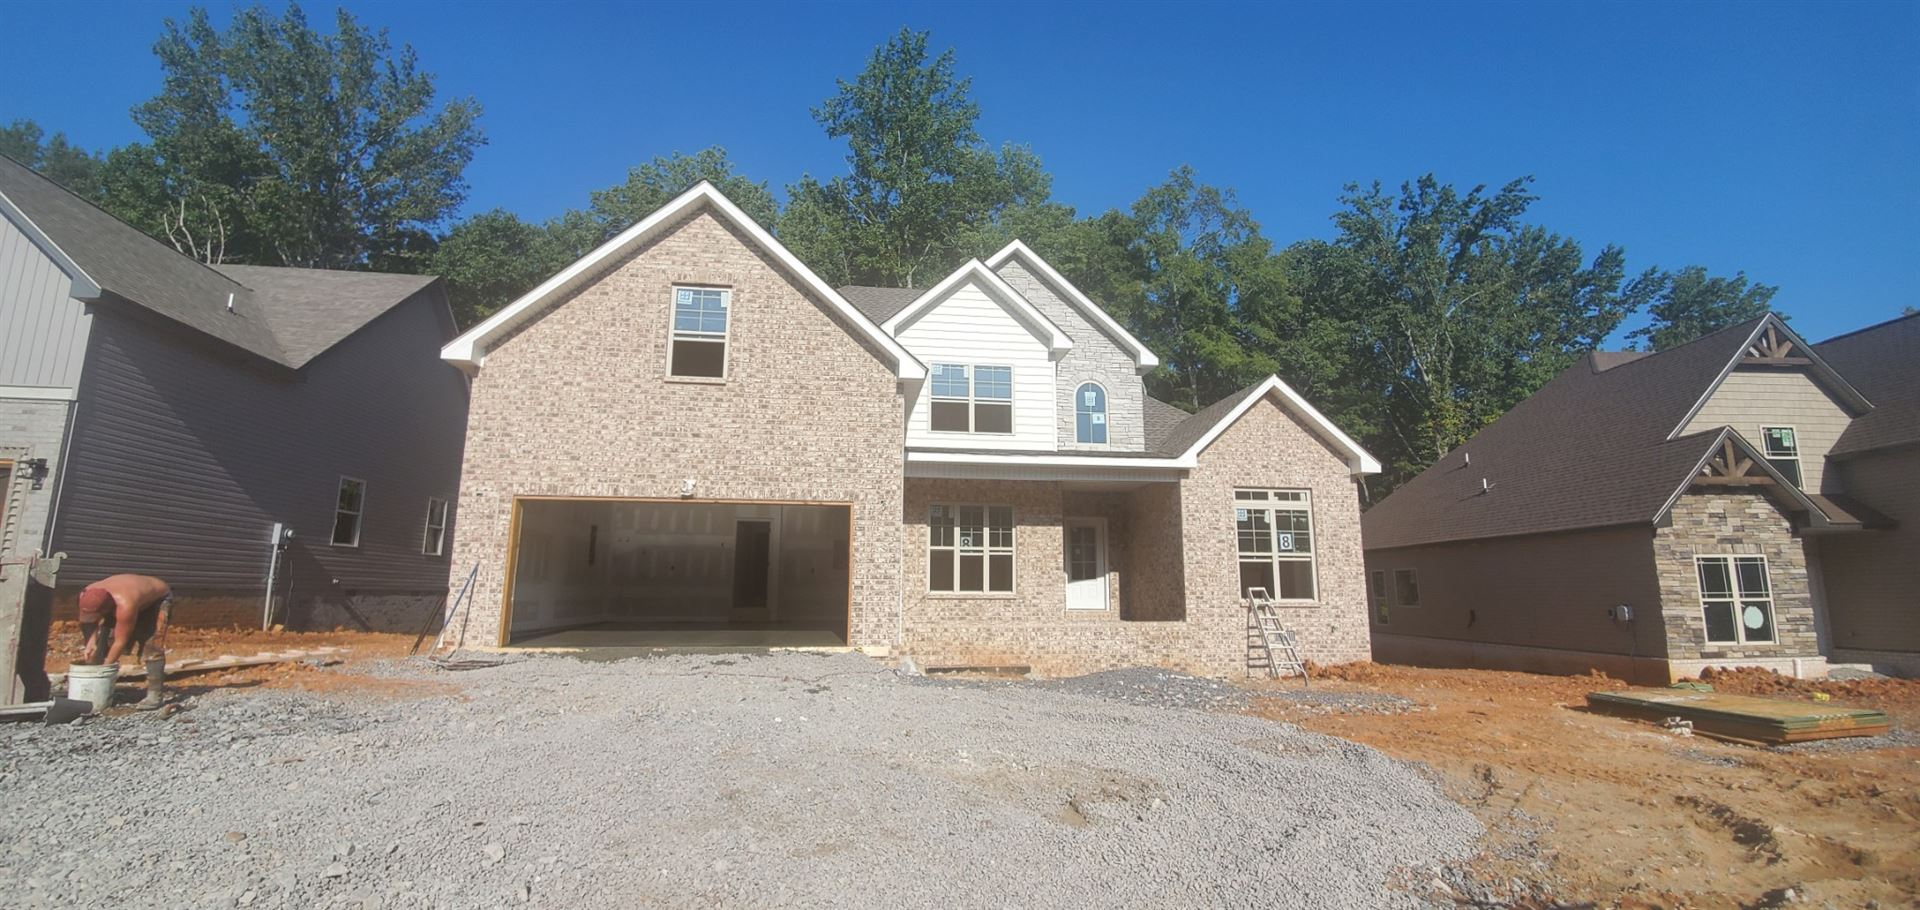 8 Glenstone Village, Clarksville, TN 37043 - MLS#: 2256785